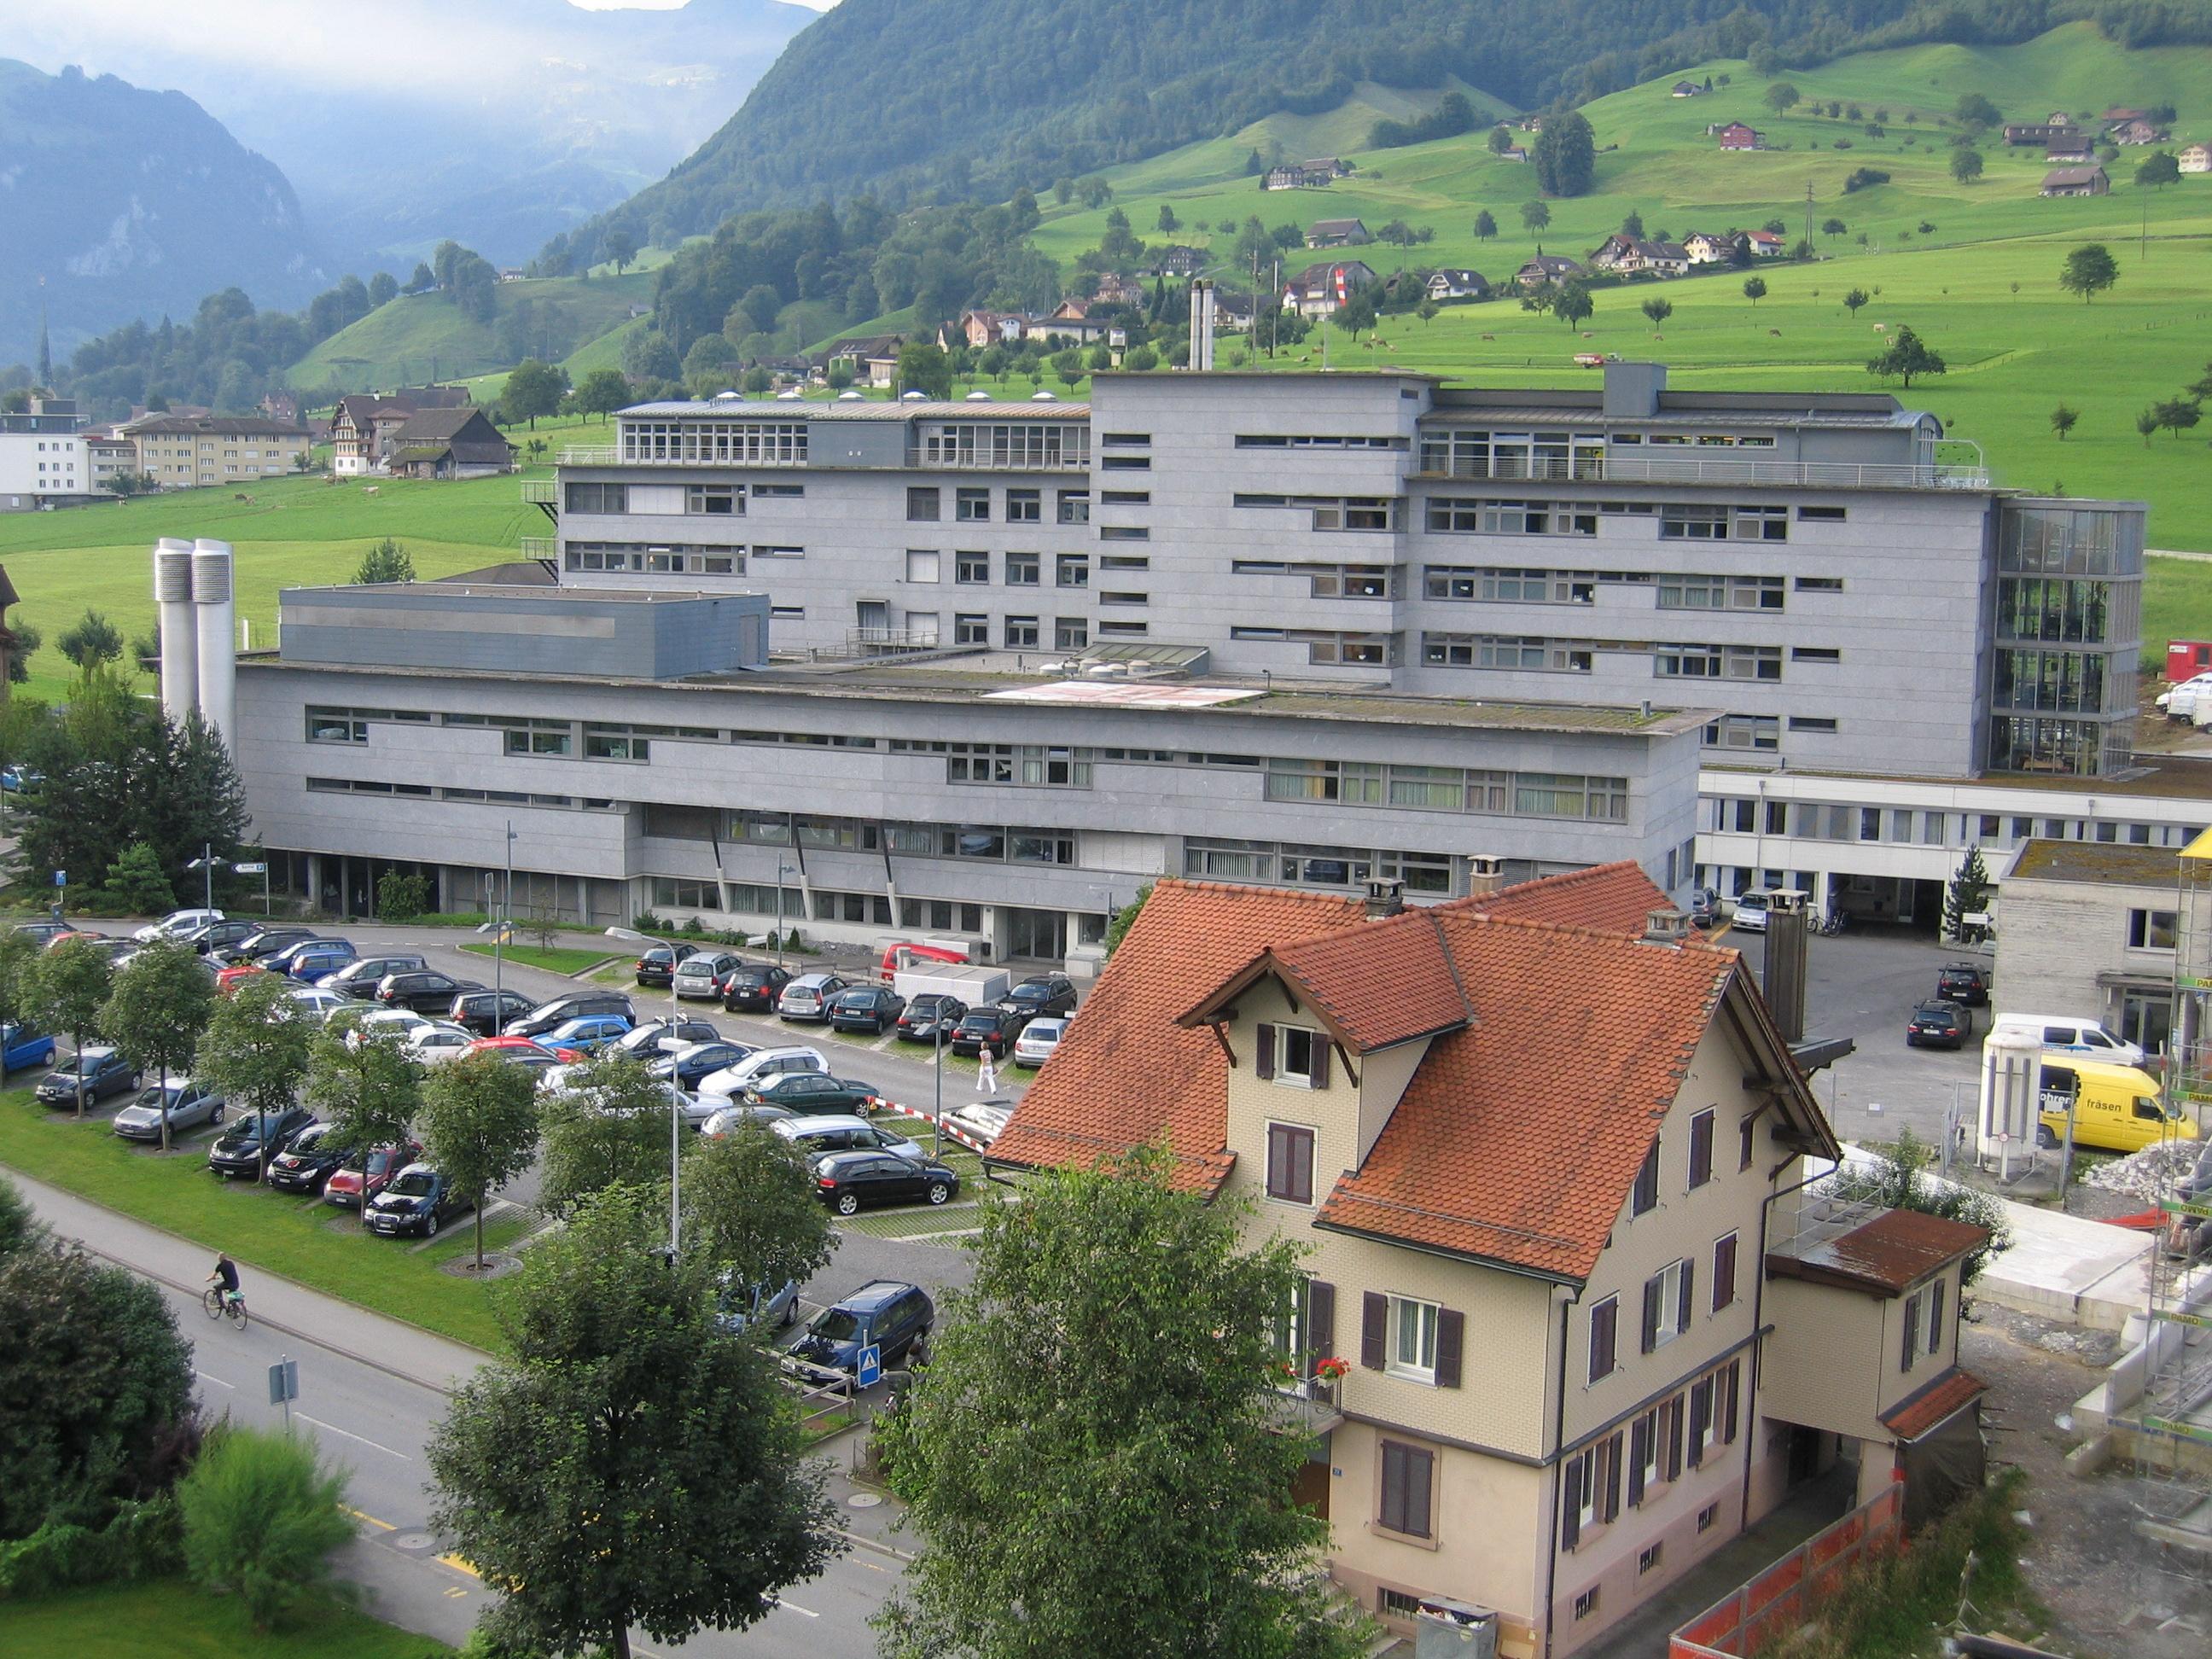 FileCantonal hospital of Canton Nidwaldenjpg Wikimedia Commons